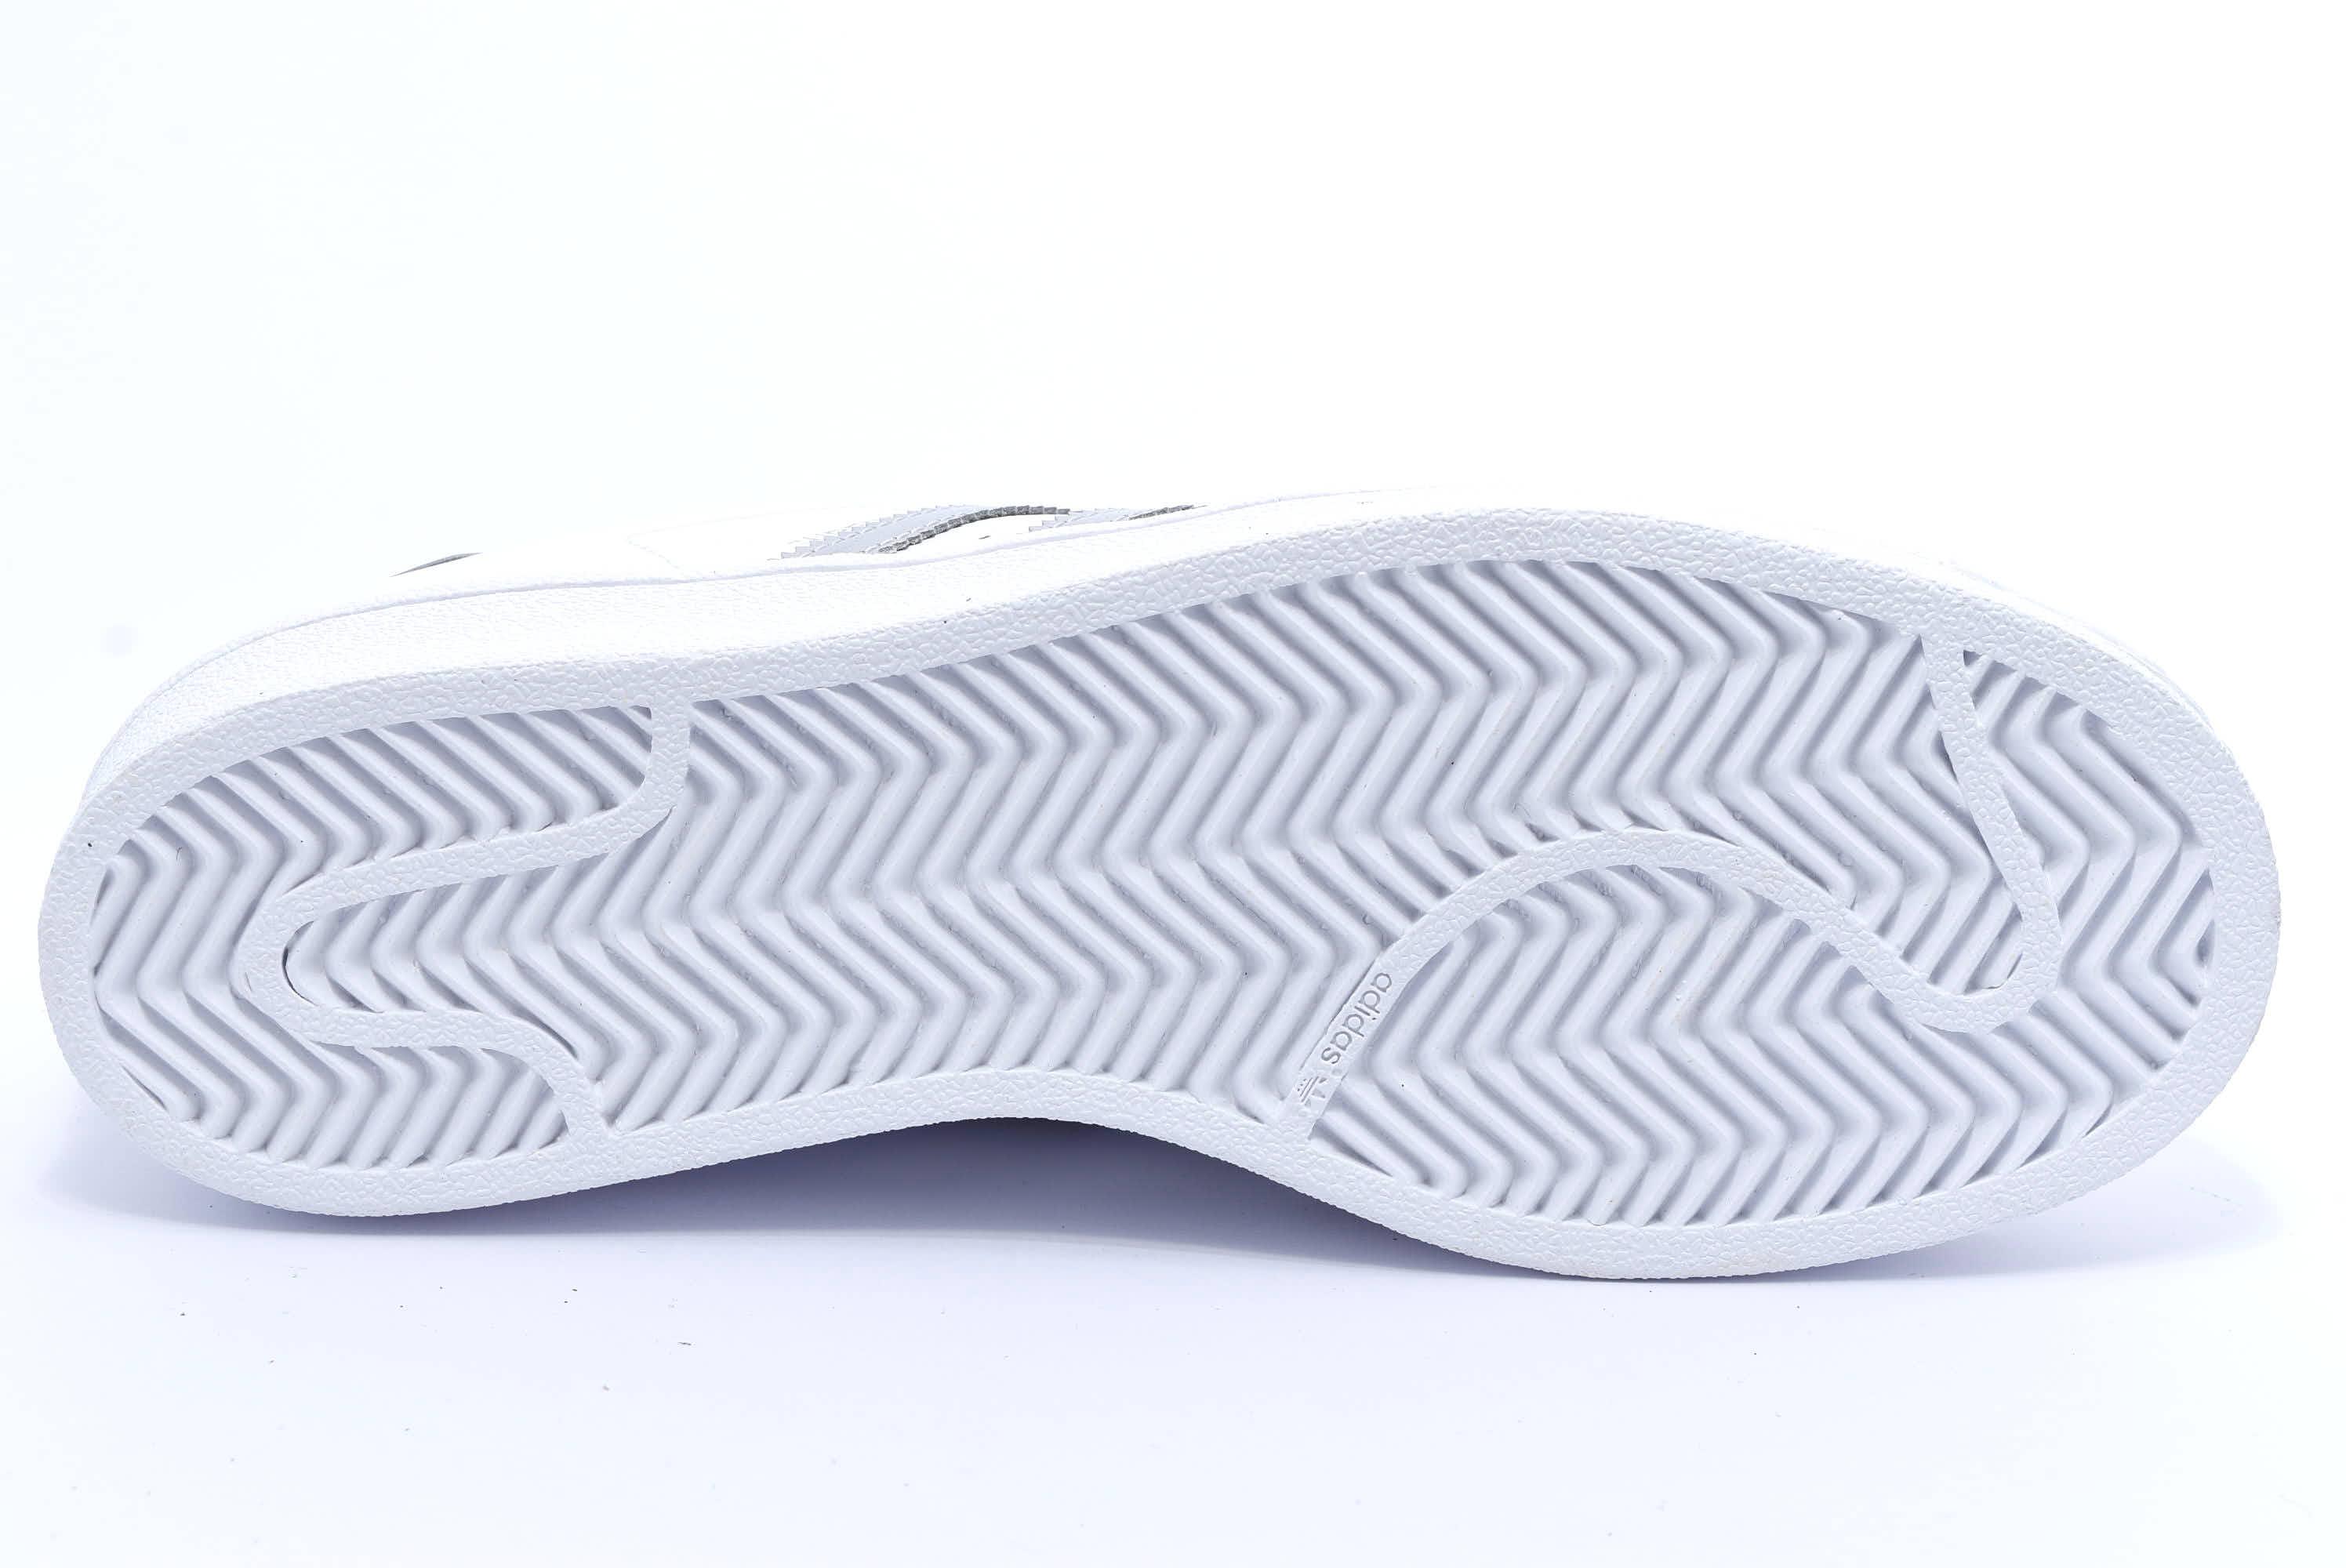 adidas scarpe invernali donna